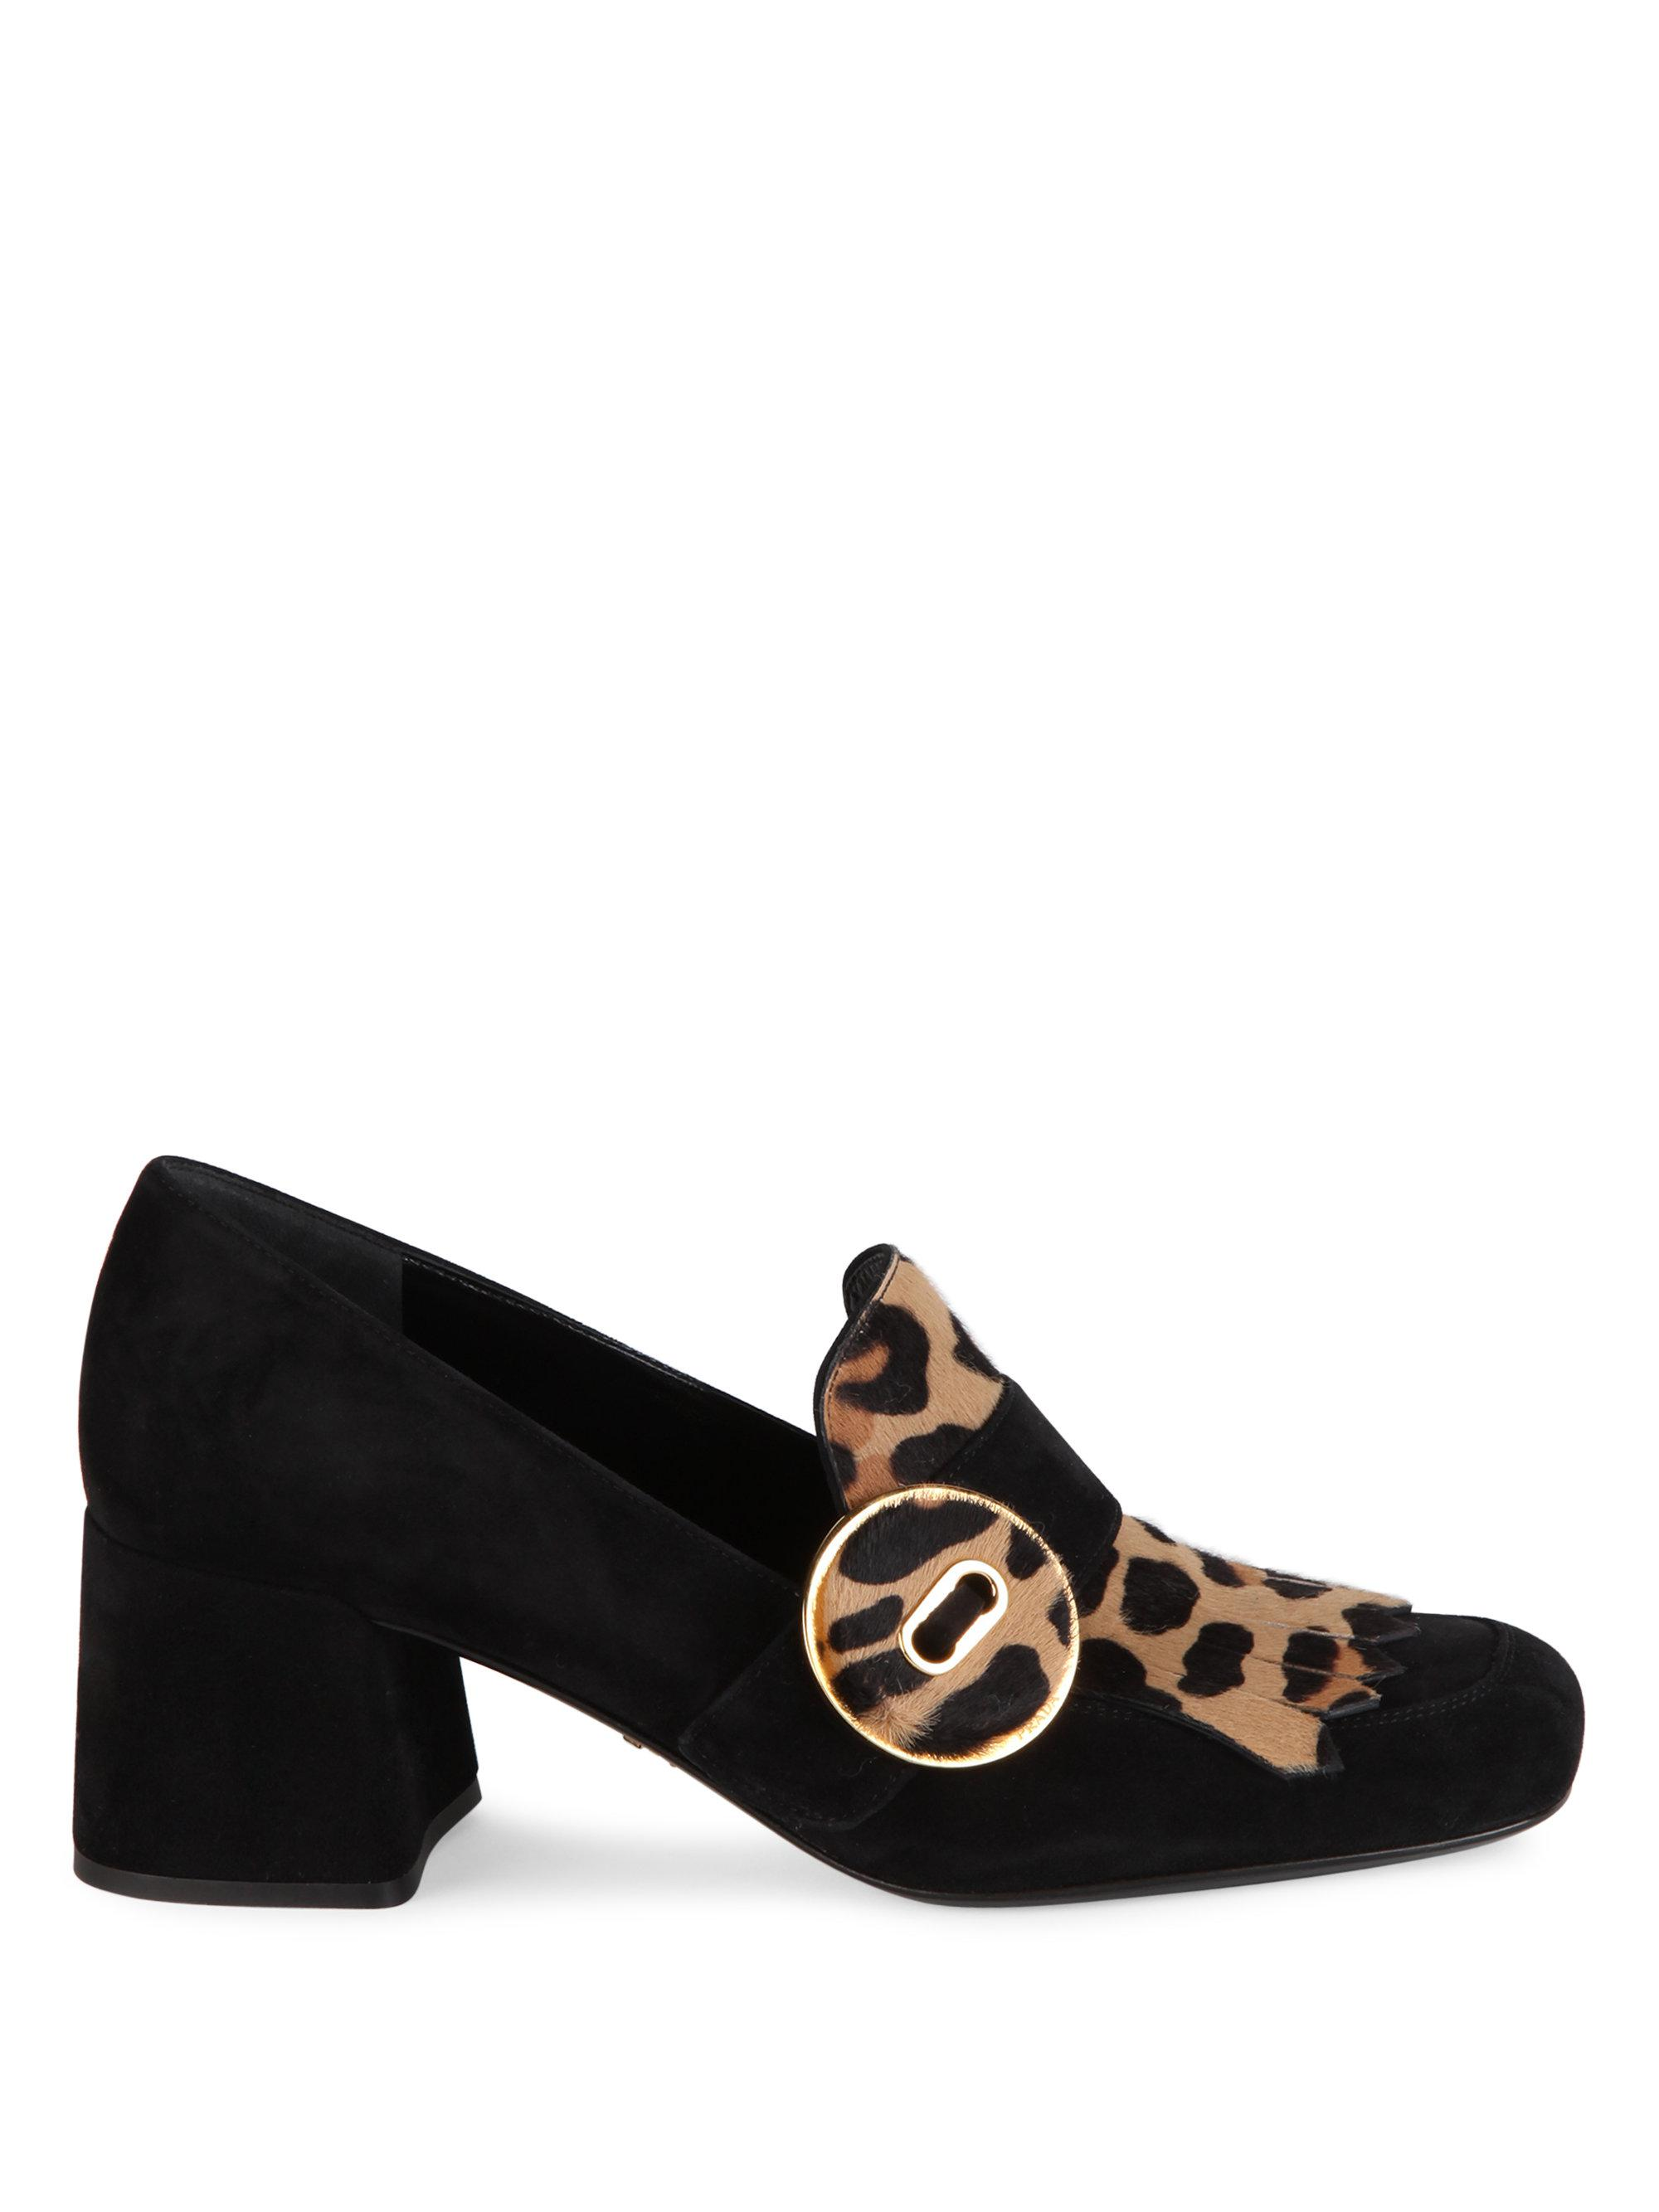 8358fd34960 Prada Suede   Leopard-print Calf Hair Kiltie Pumps in Black - Lyst